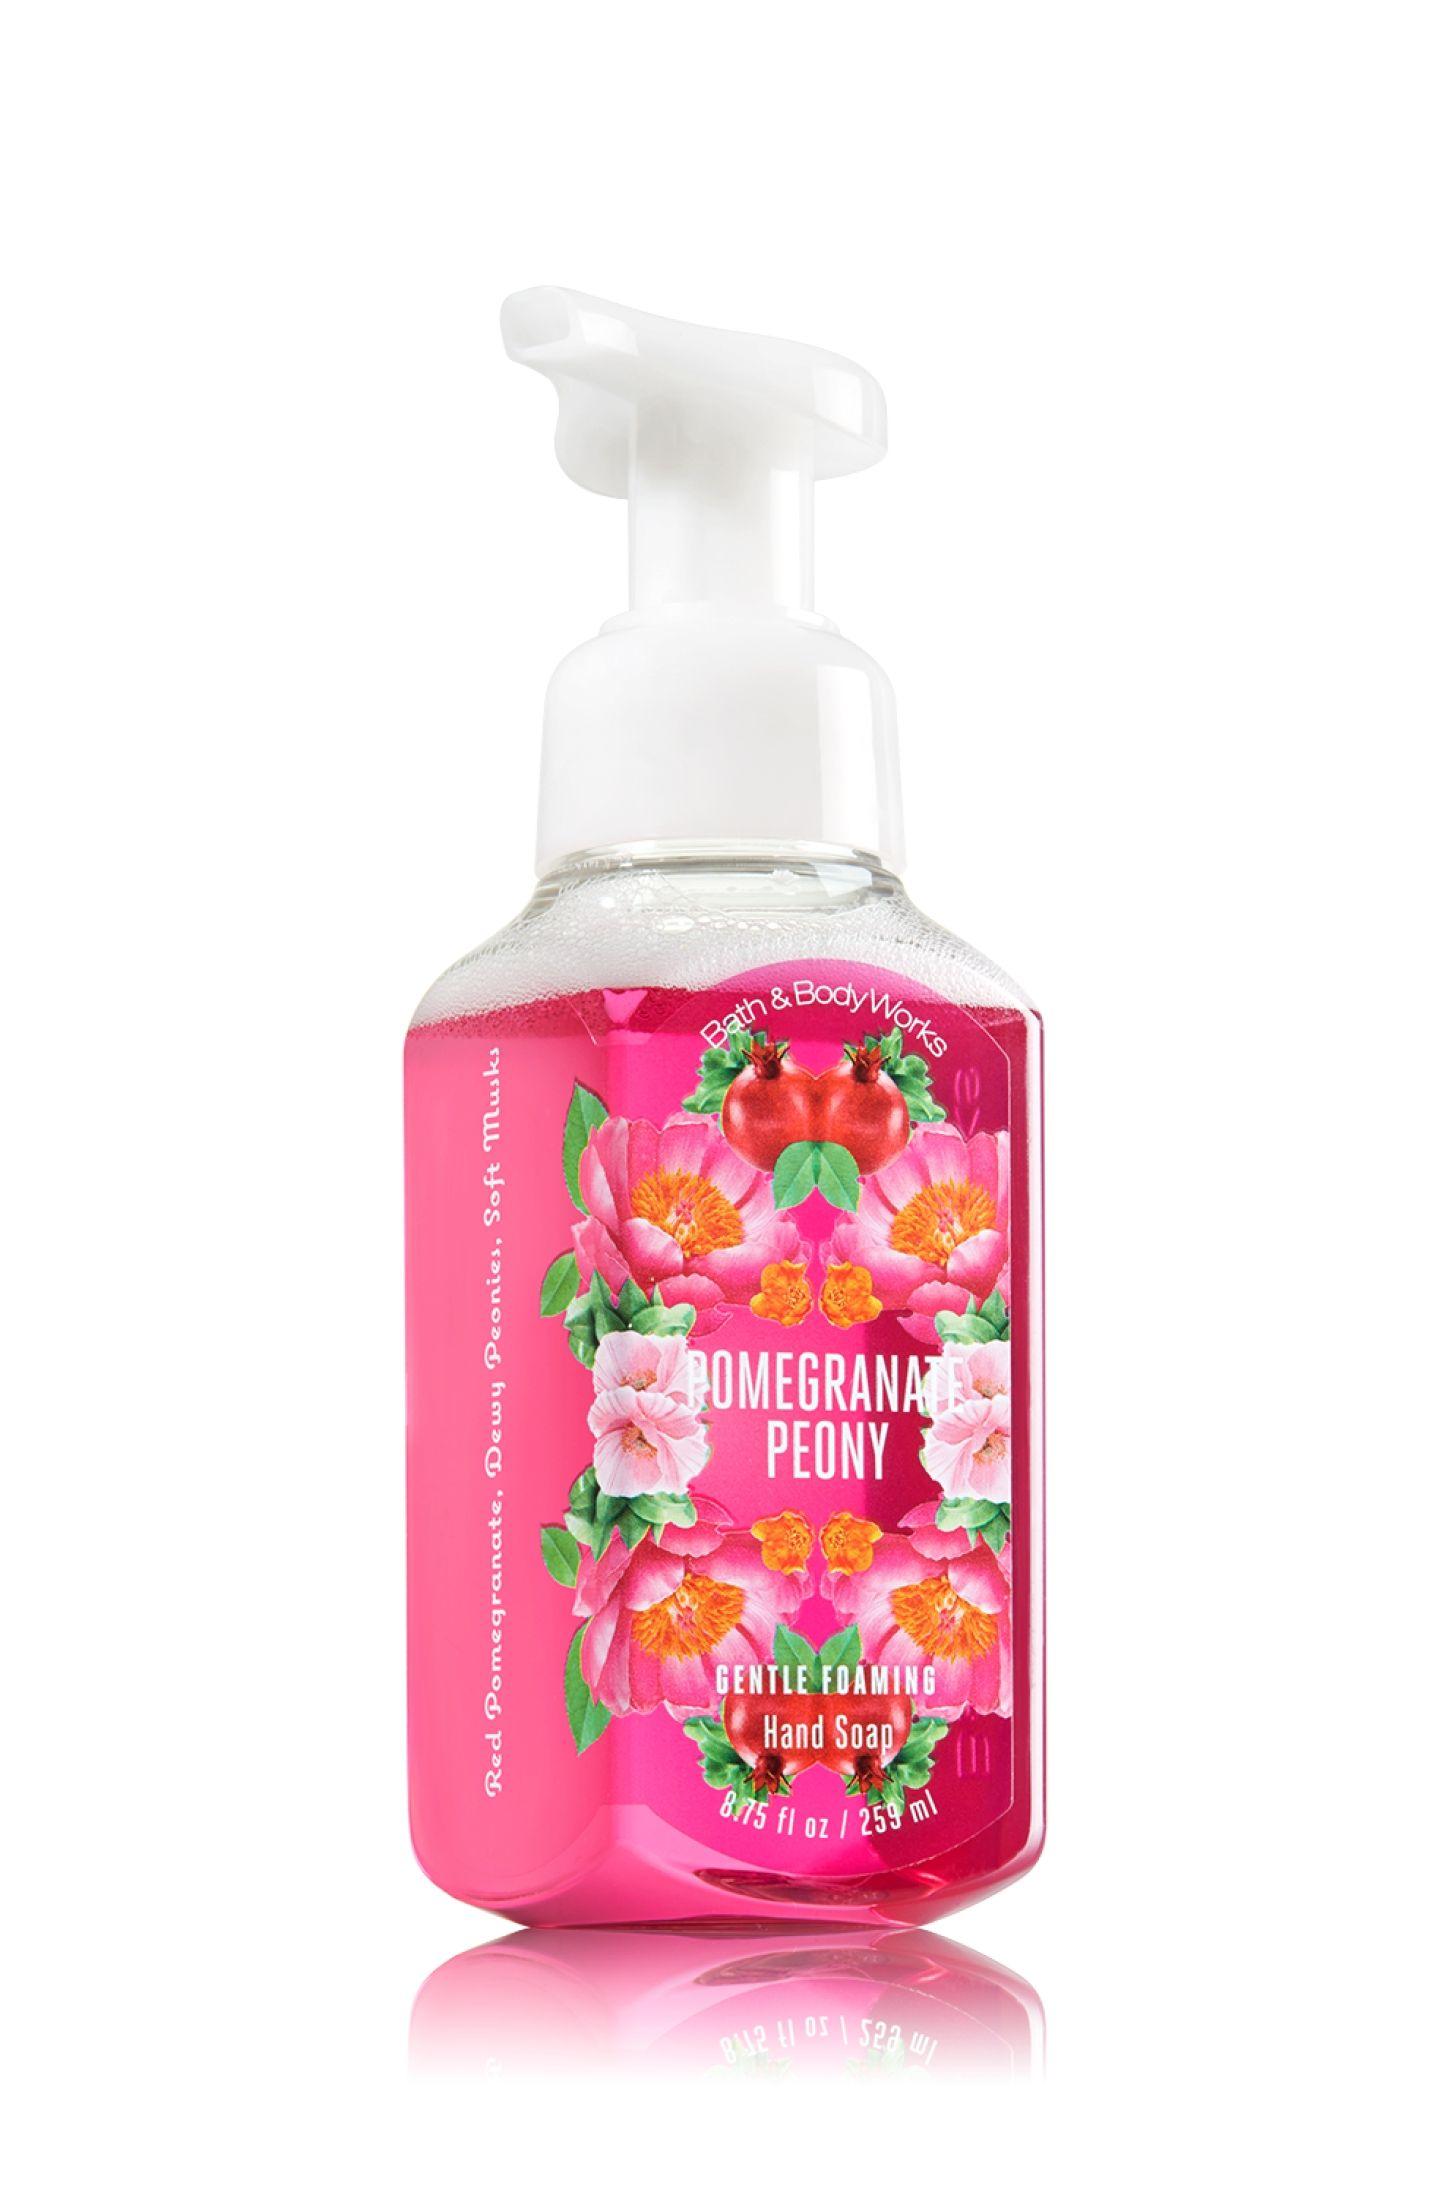 Pomegranate Peony Gentle Foaming Hand Soap Soap Sanitizer Bath